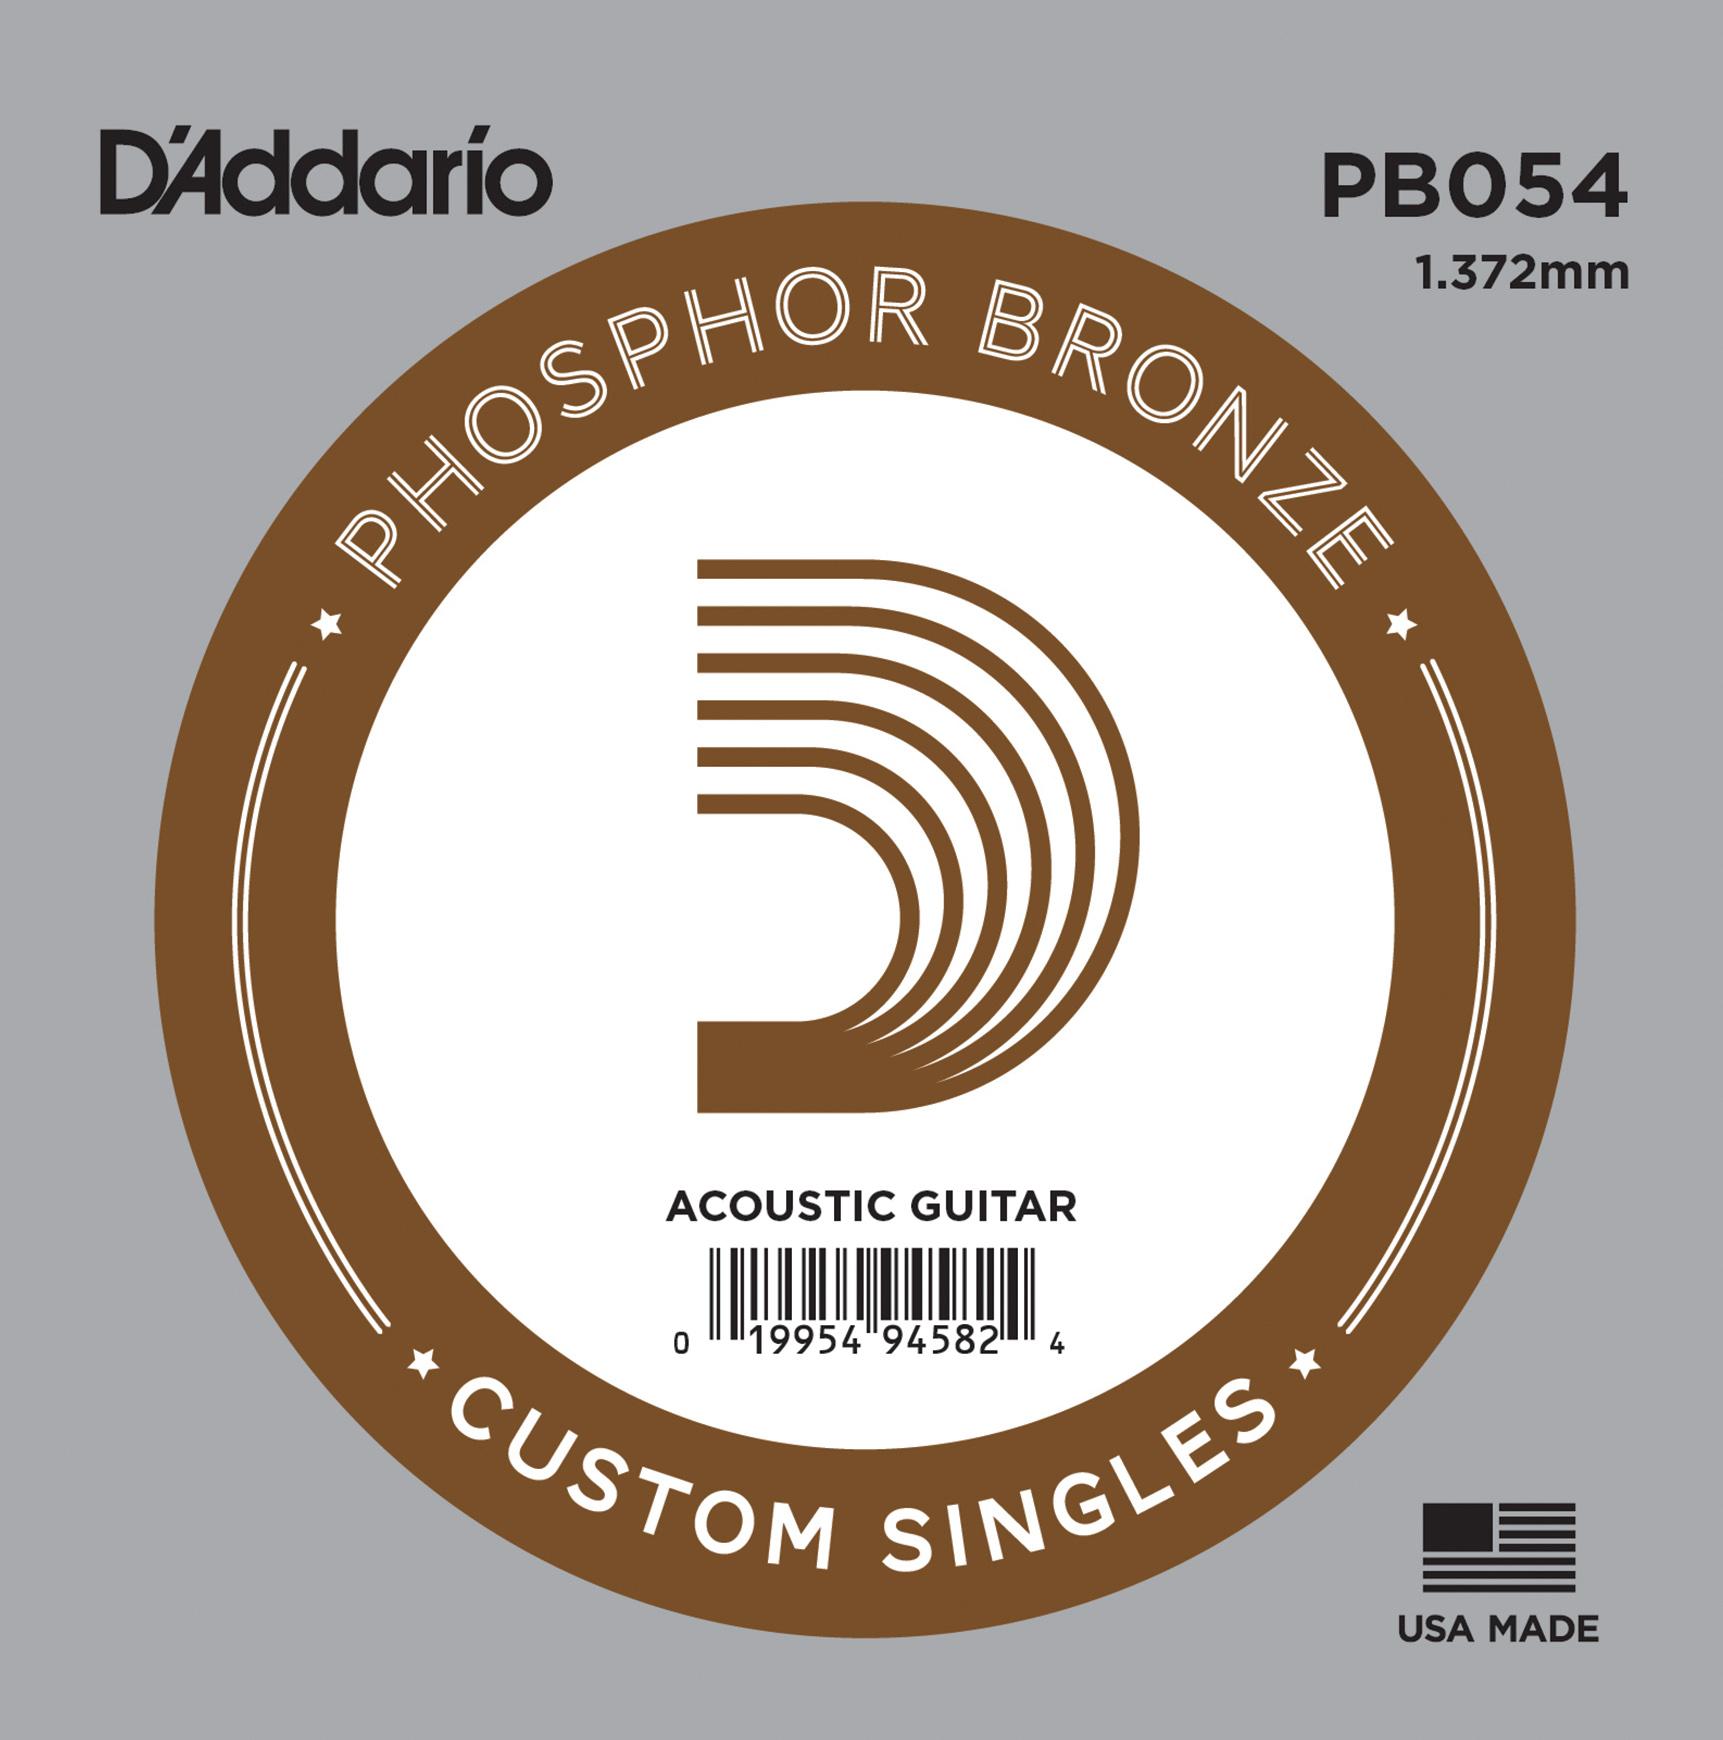 DADD Single Phosphor Bronze wnd 054